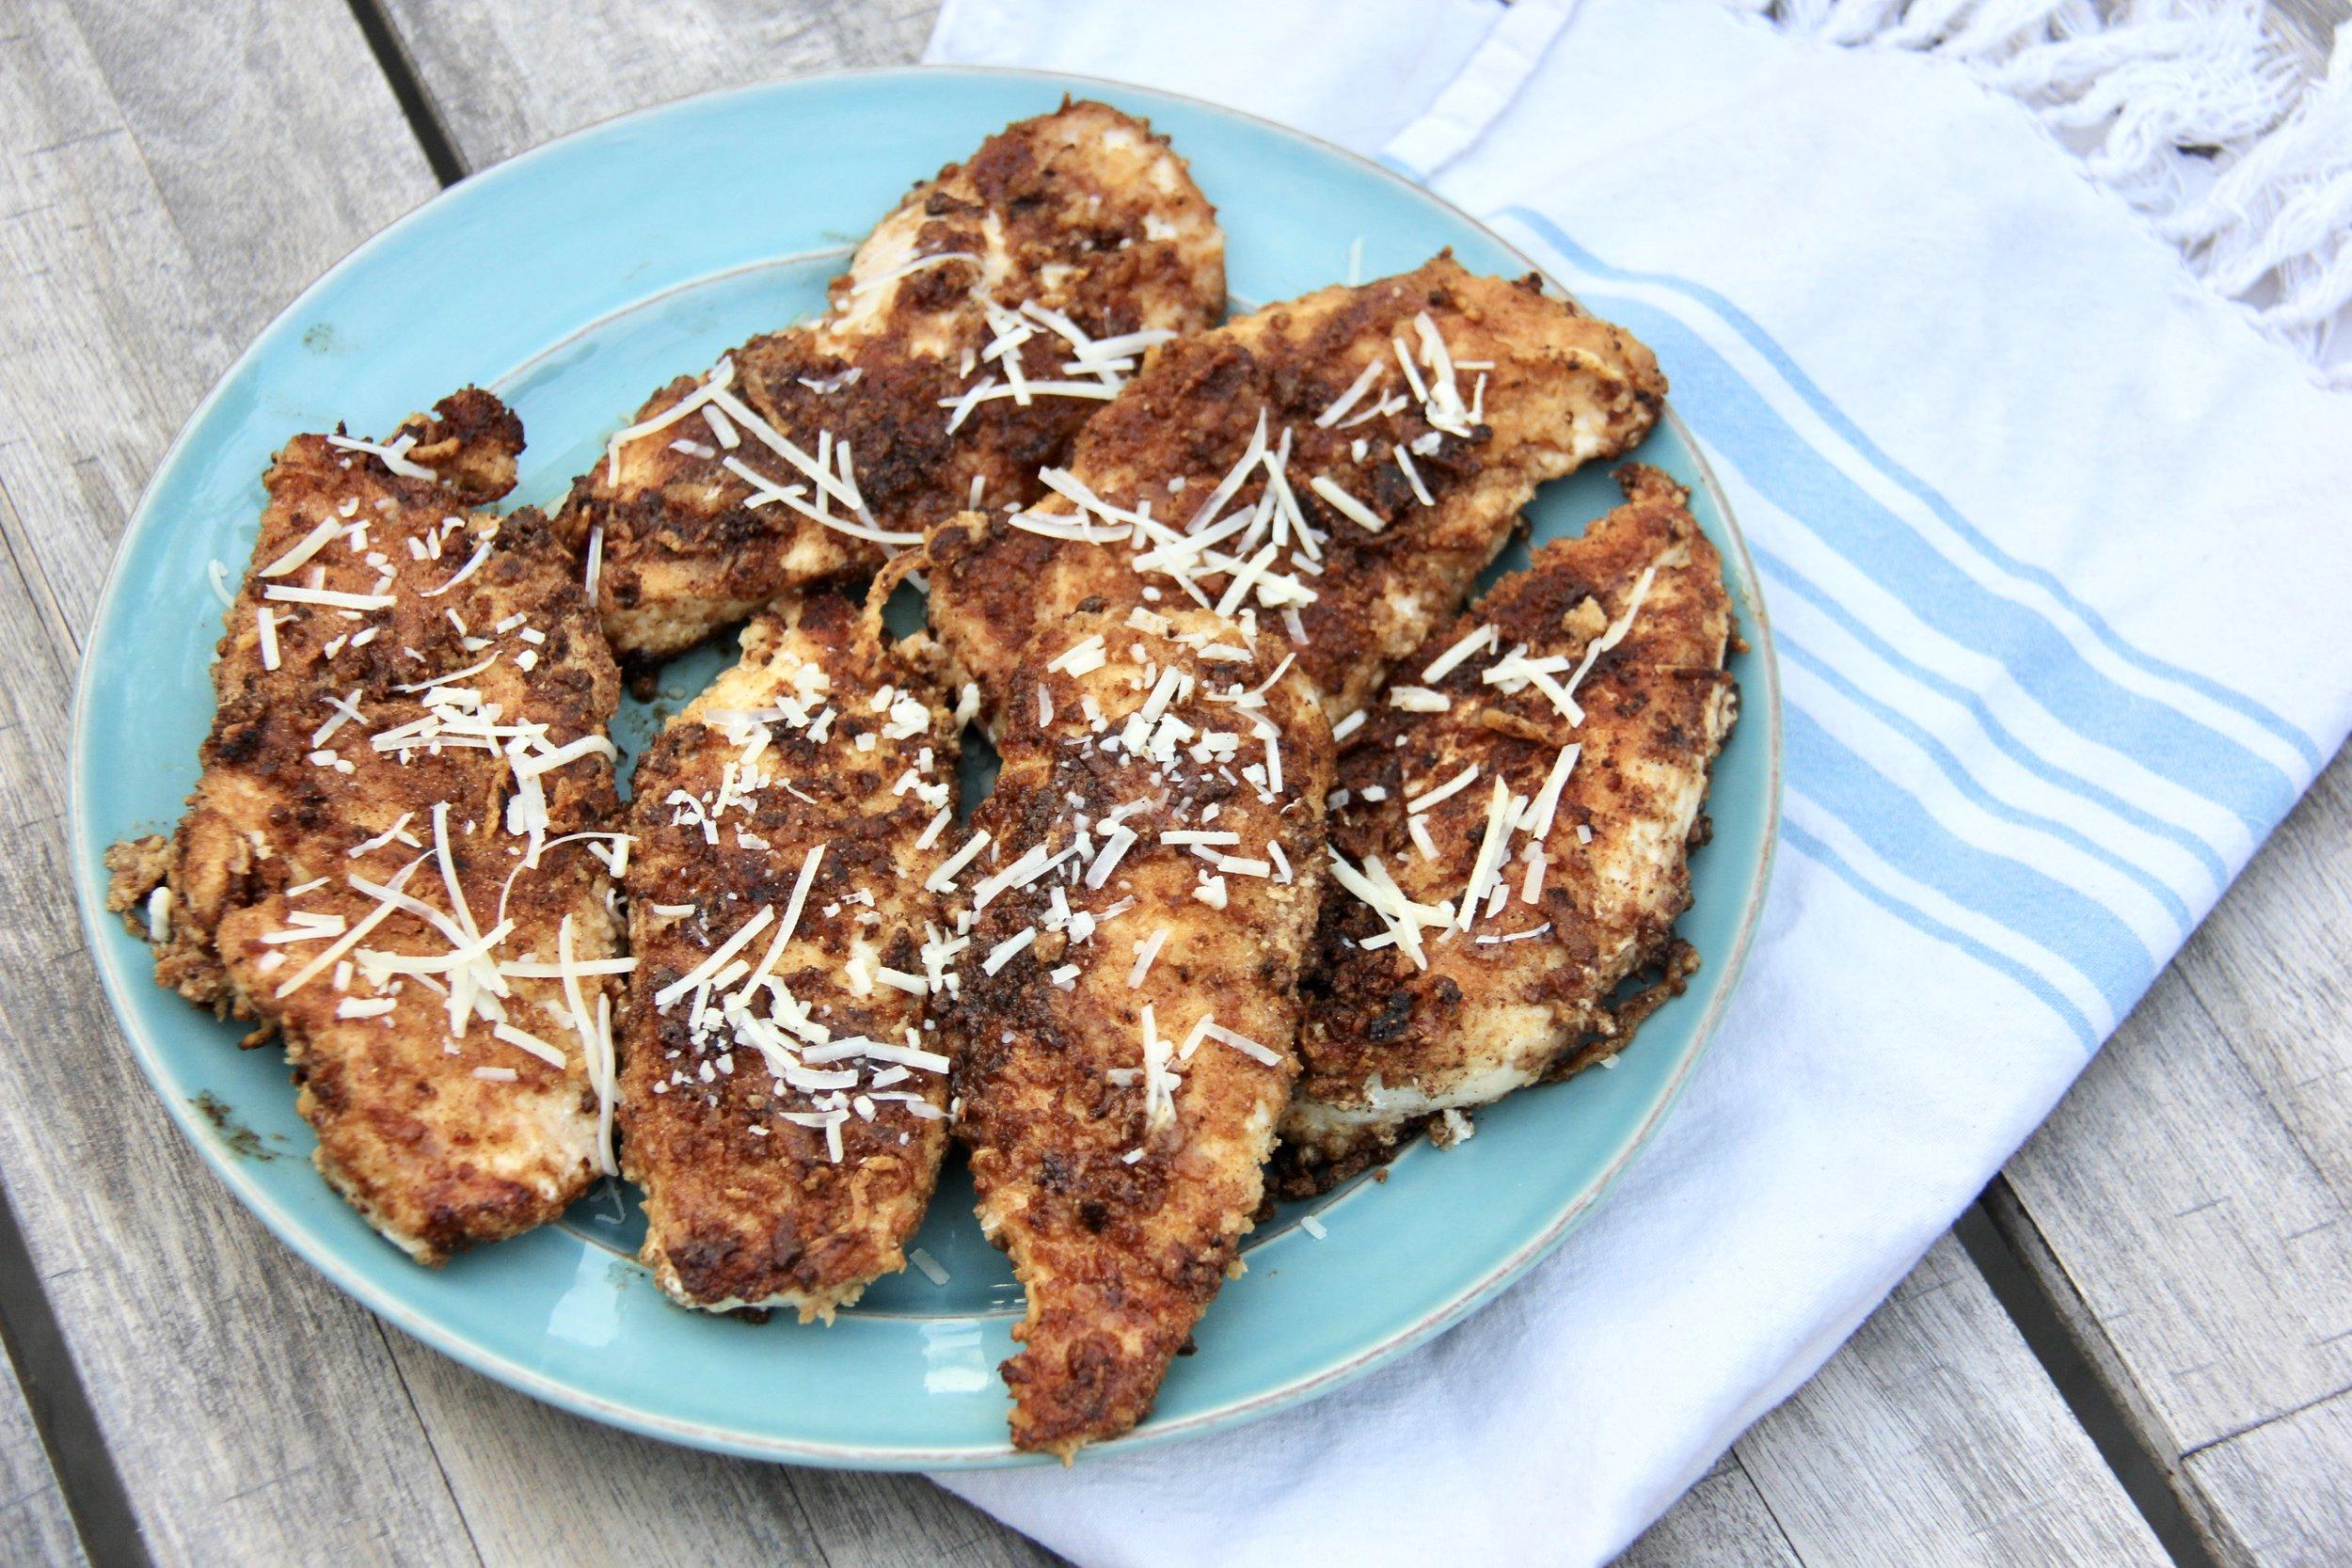 Kodiak Cakes Crispy Quick Parmesan Chicken